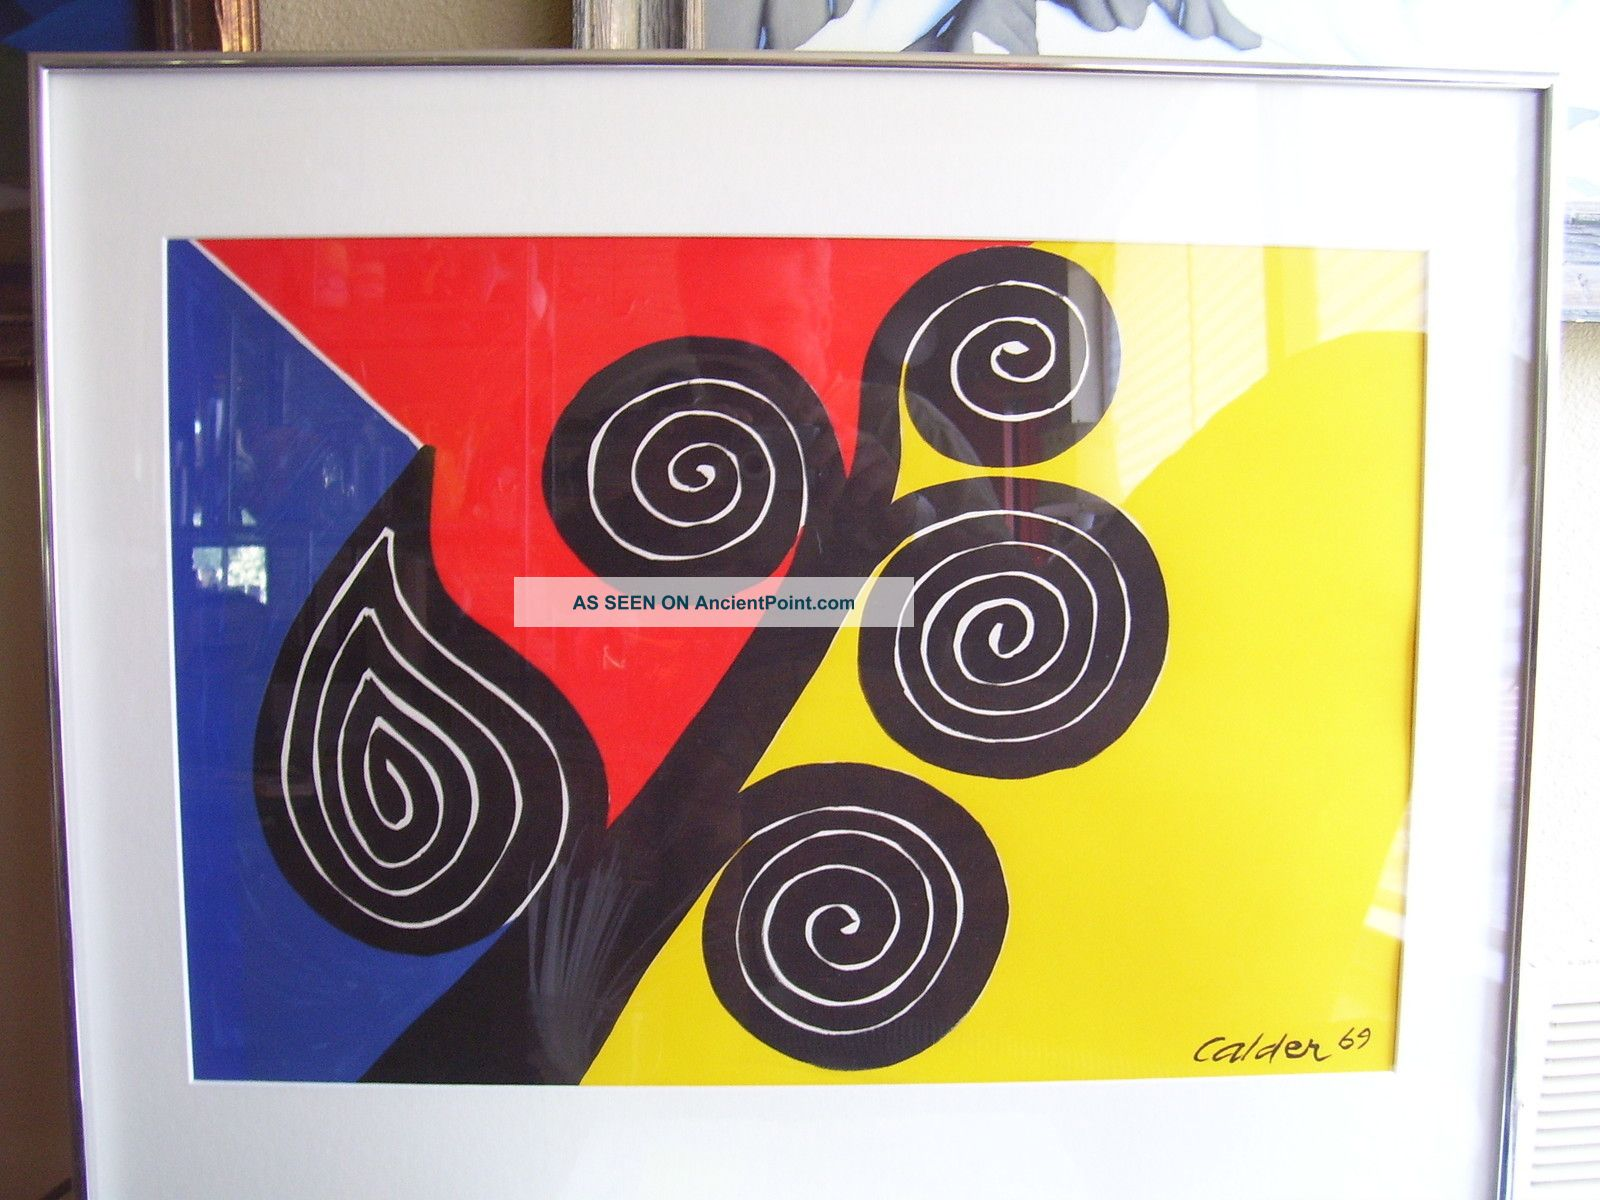 Charming Mid Century Modern Wall Art #3: Midcentury_modern_framed_alexander_calder_art_print_of_autumn_spirals_1_lgw.jpg